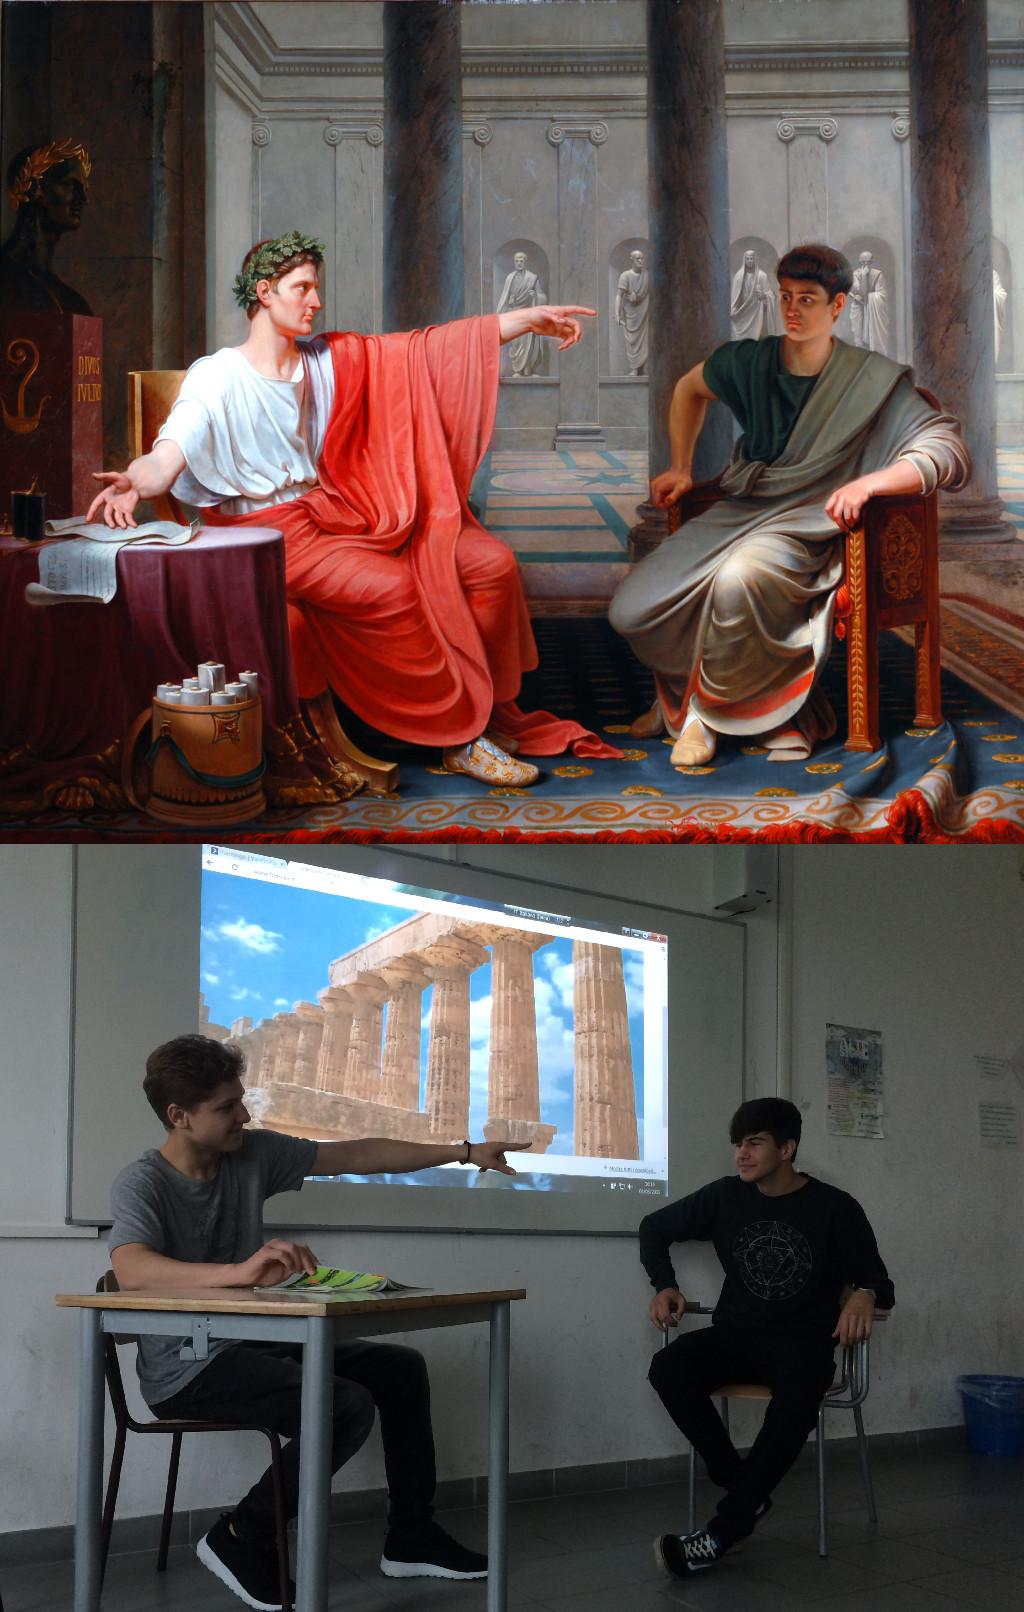 The Emperor Augustus Rebuking Cornelius Cinna for His Treachery, Étienne-Jean Delécluze vanGo'd by Cosmin and Marco